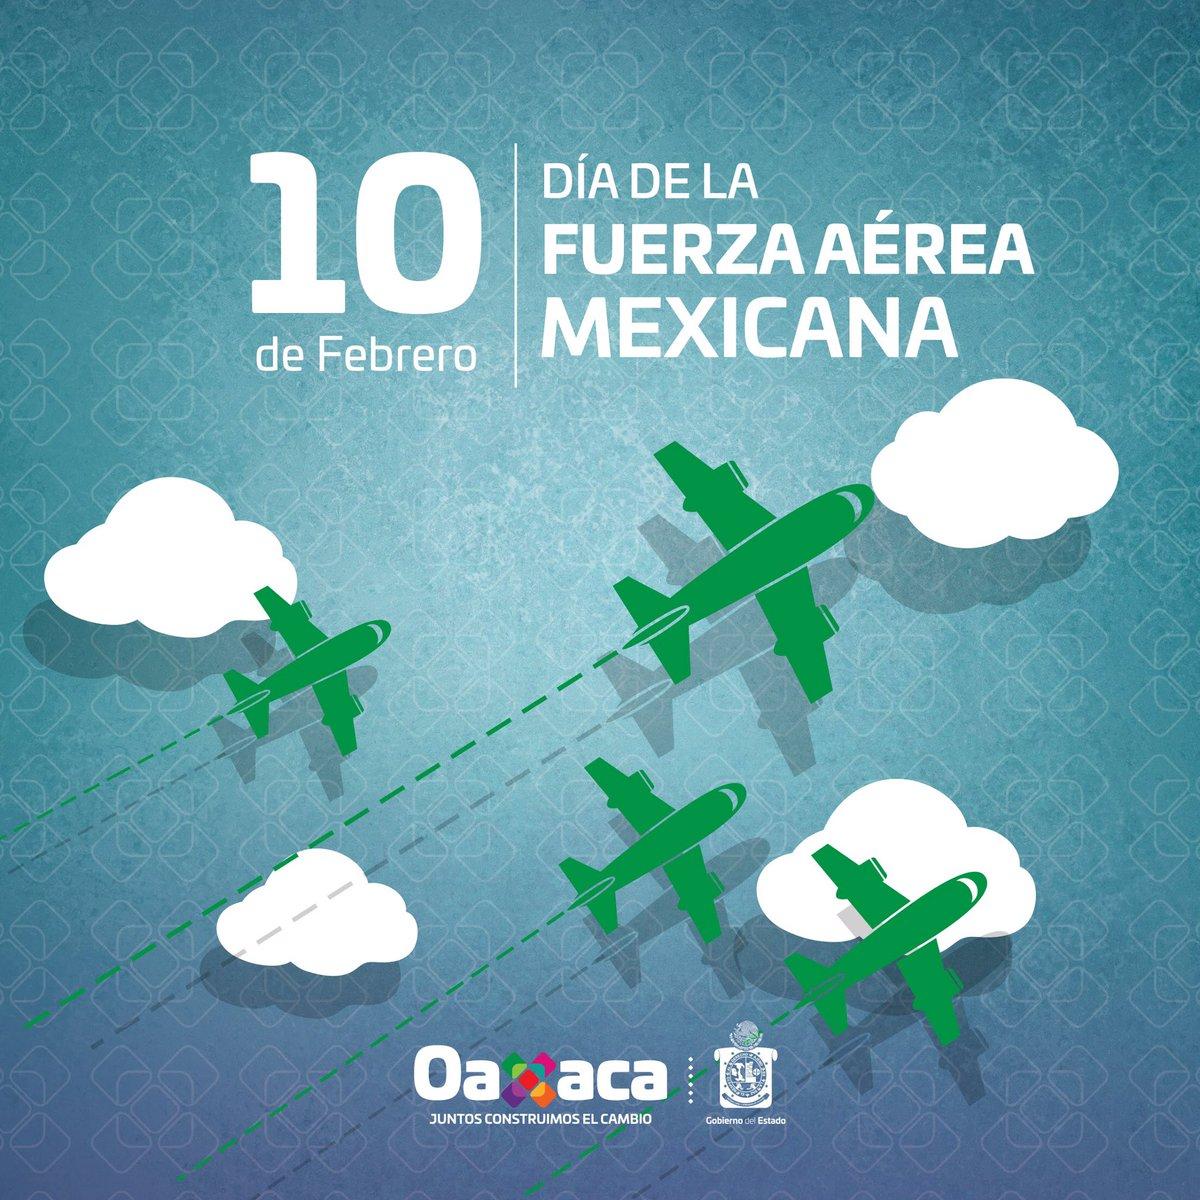 Gobierno de Oaxaca's photo on #FuerzaAéreaMexicana